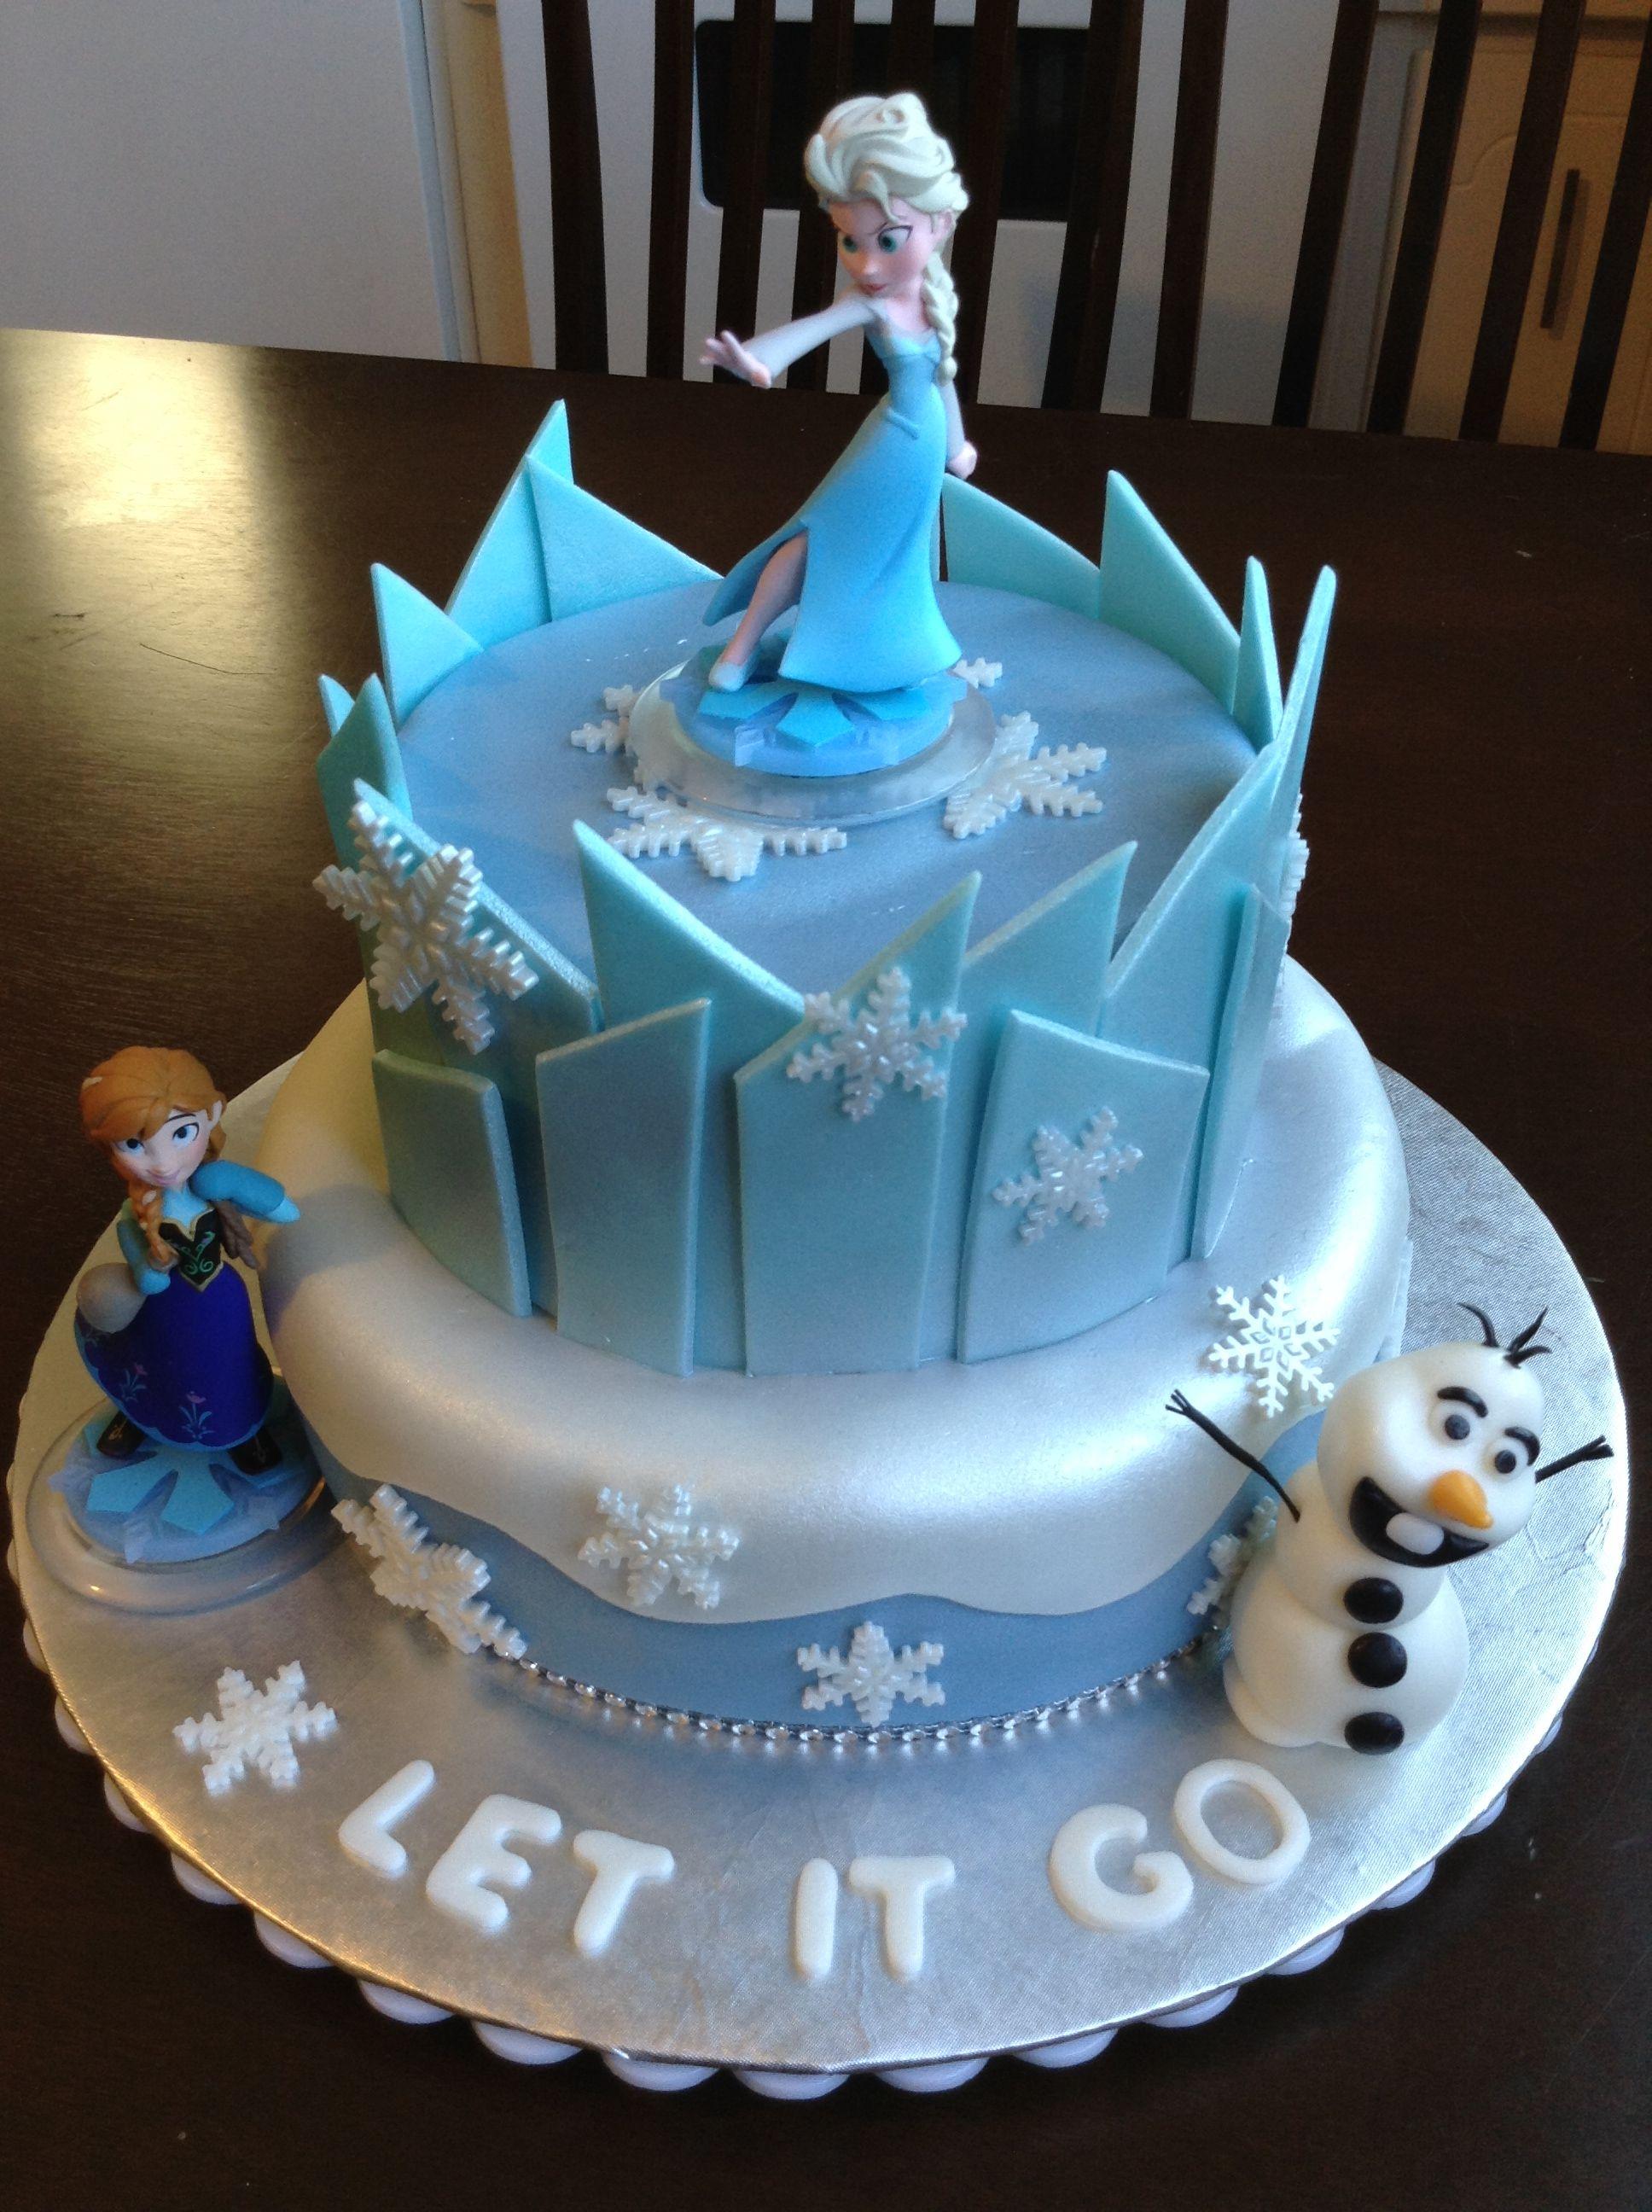 Two Tier Frozen Cake AC275 Amarantos Cakes Frozen Cake - 1936x2592 ...